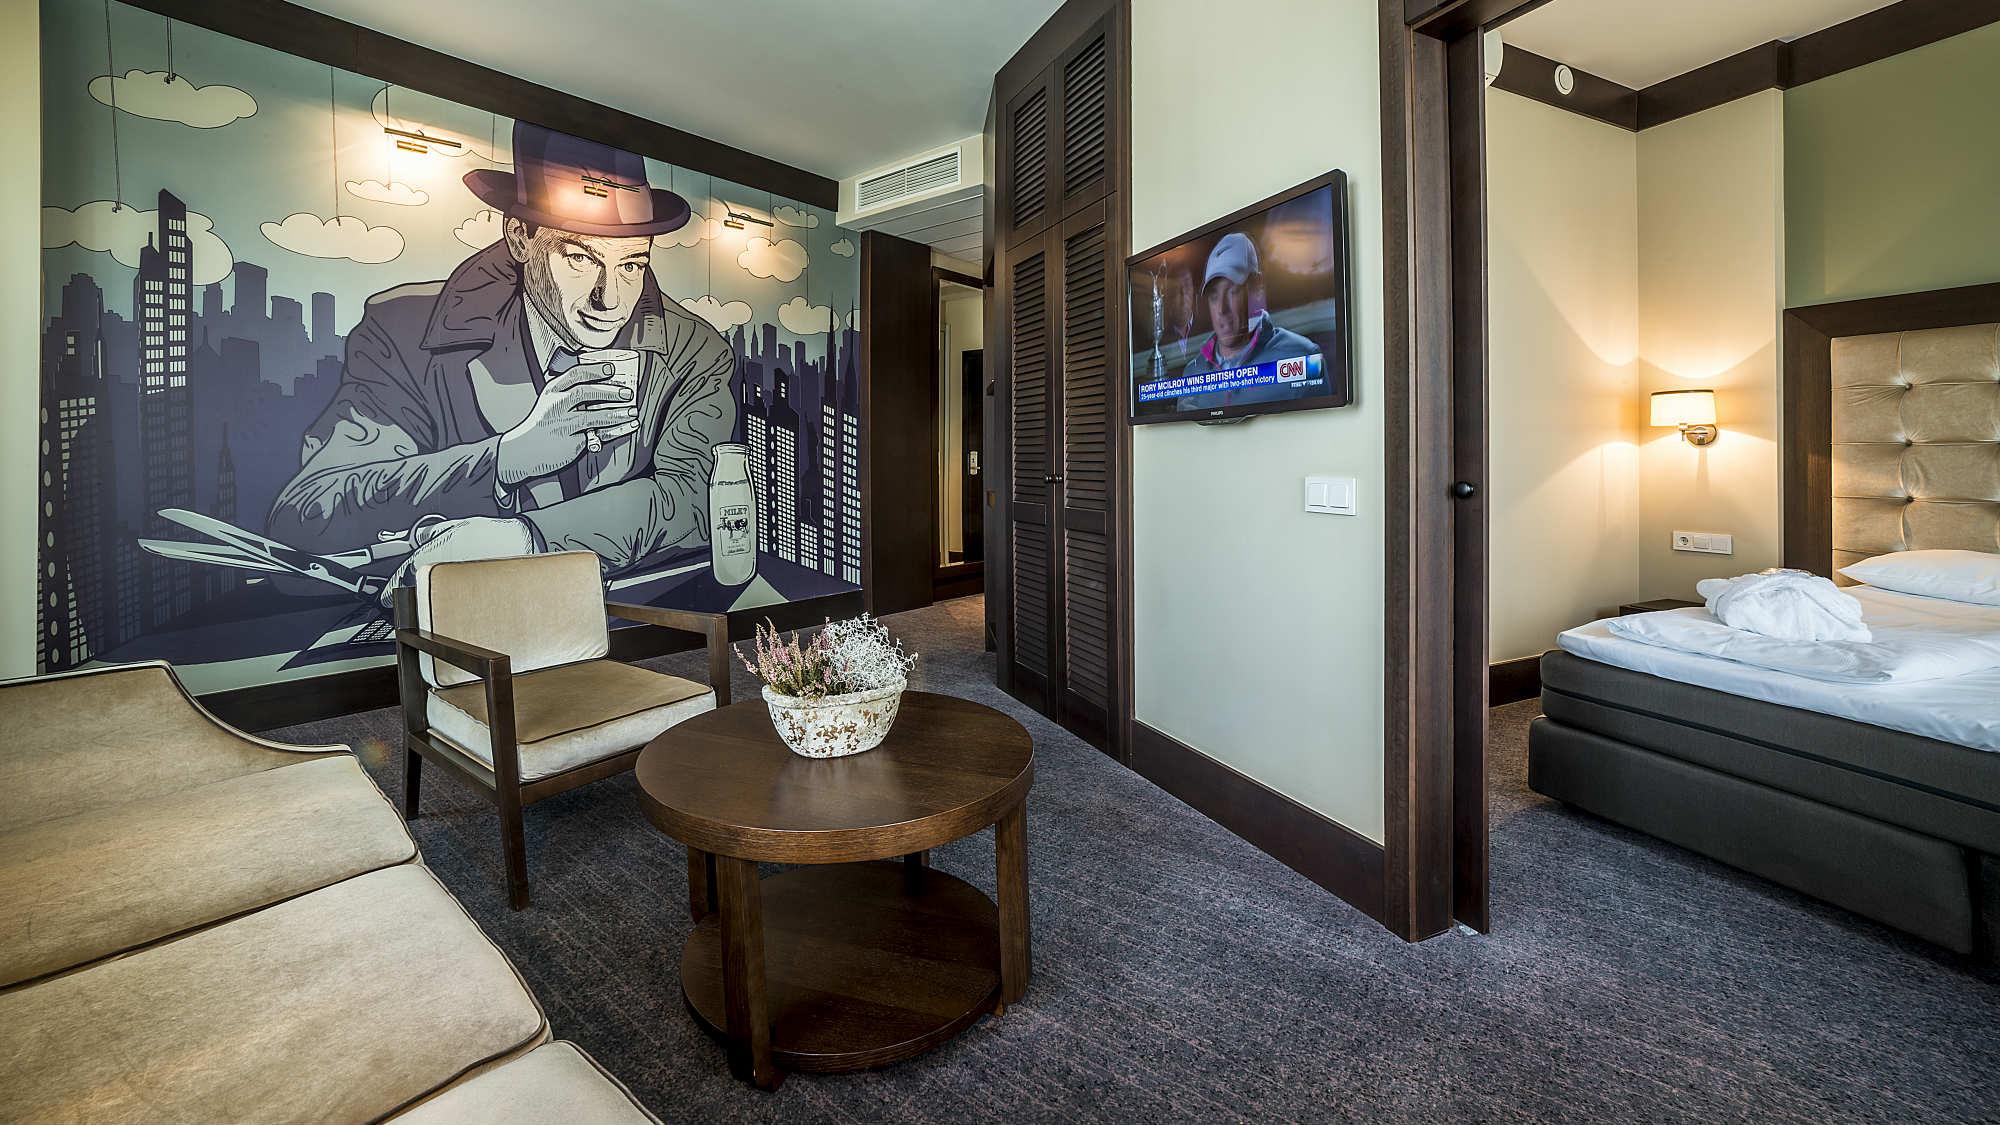 Фото отеля Comfort Hotel® LT № 23